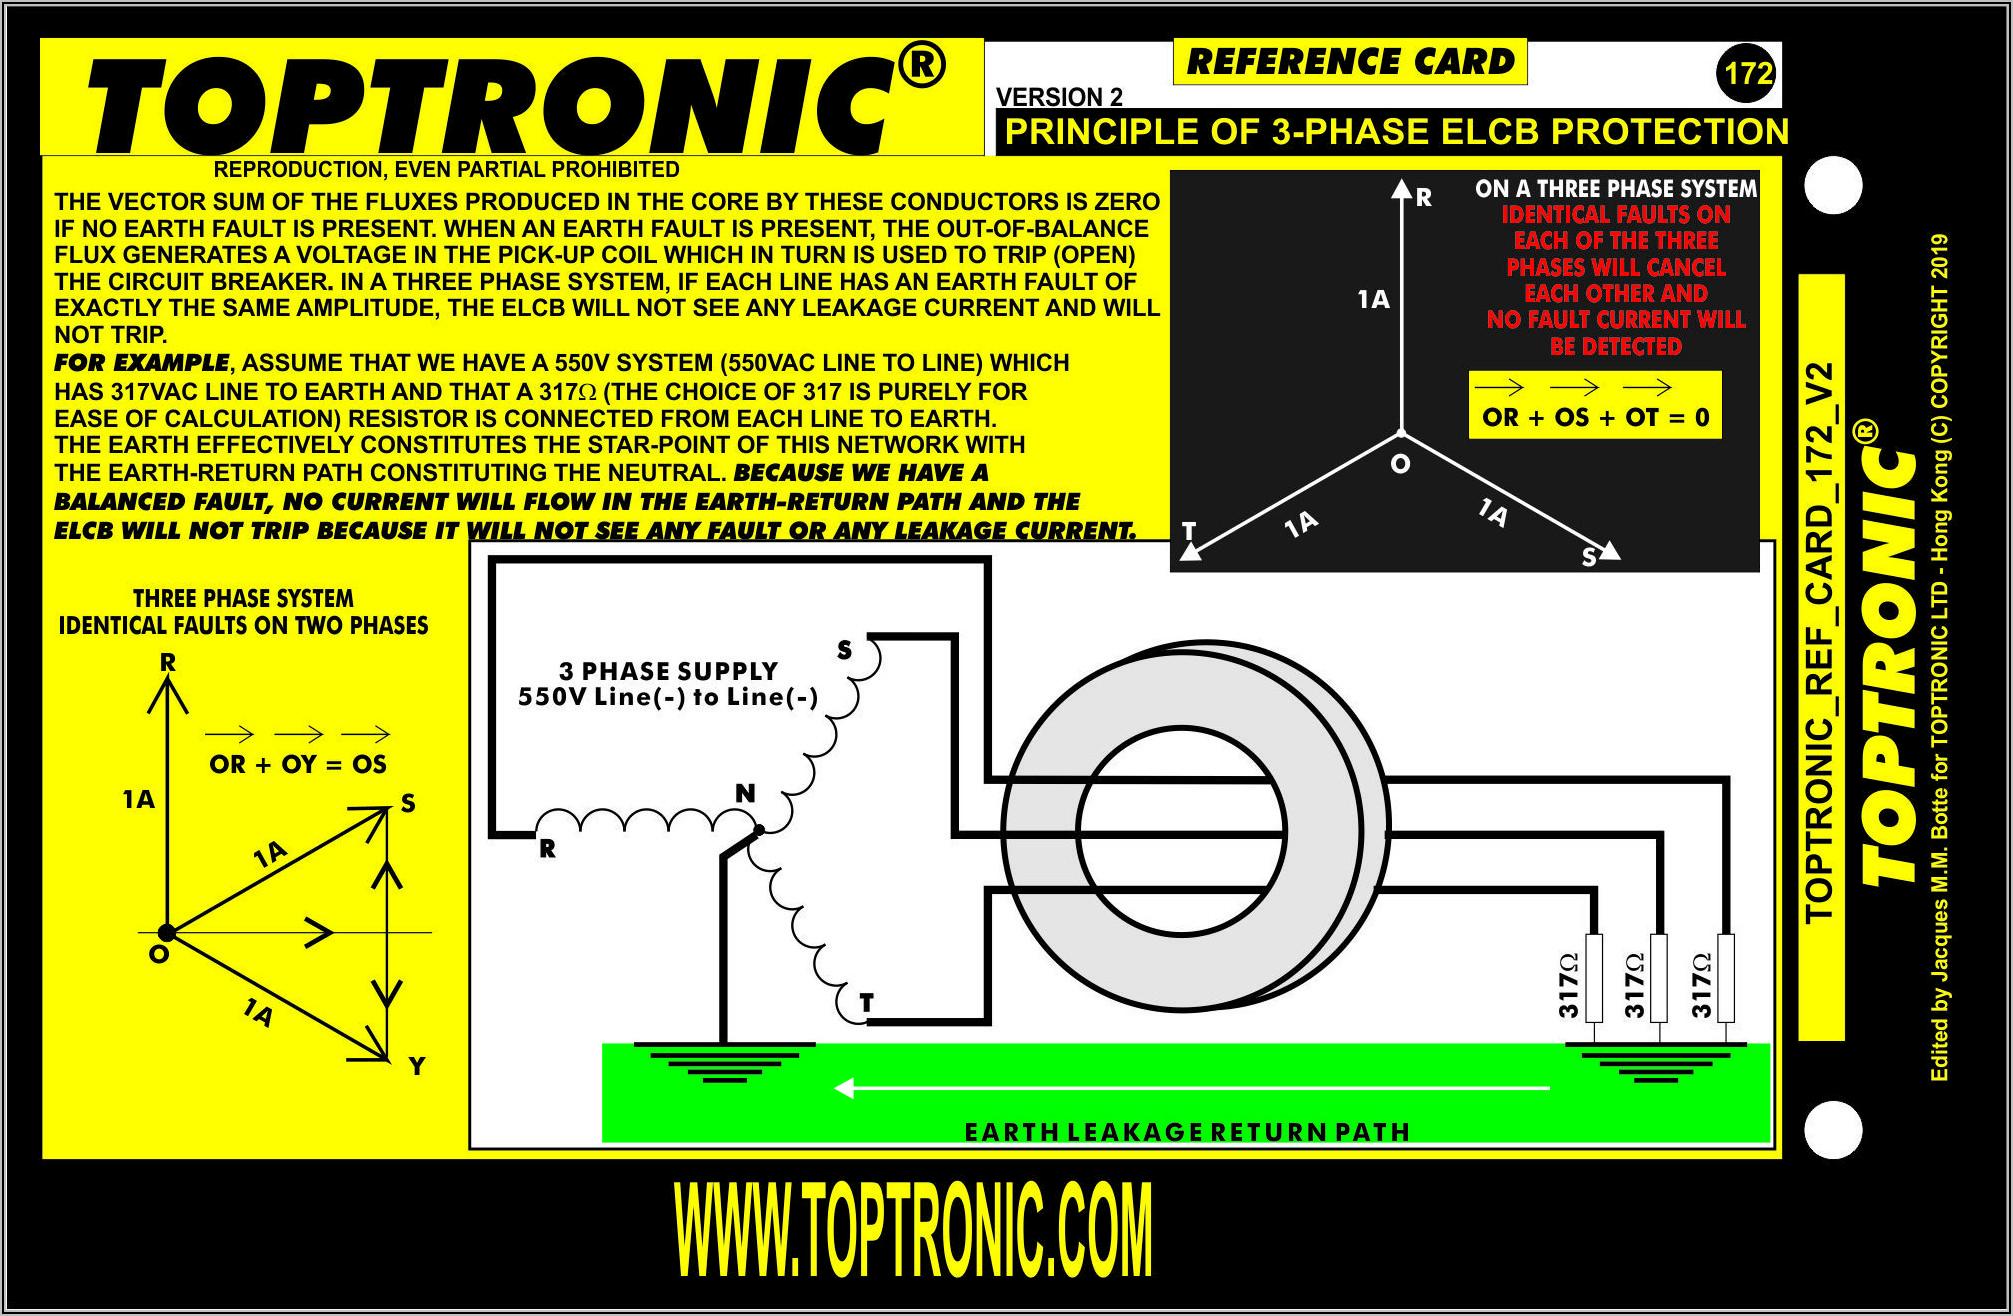 3 Phase Earth Leakage Circuit Breaker Diagram